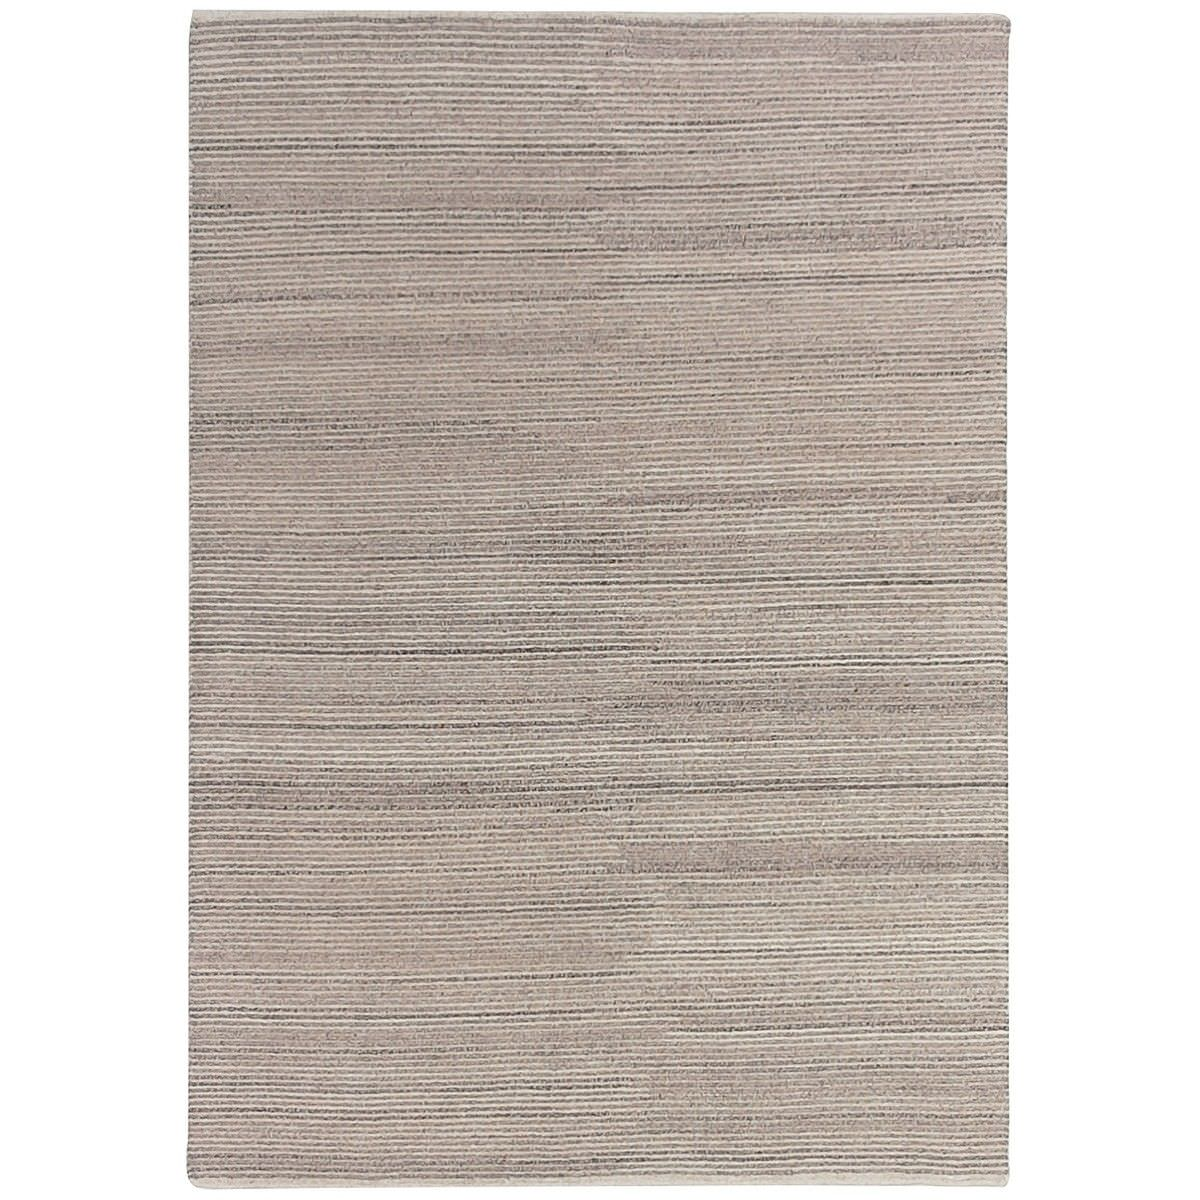 Boheme Hand Tufted Wool Rug, 300x400cm, Natural